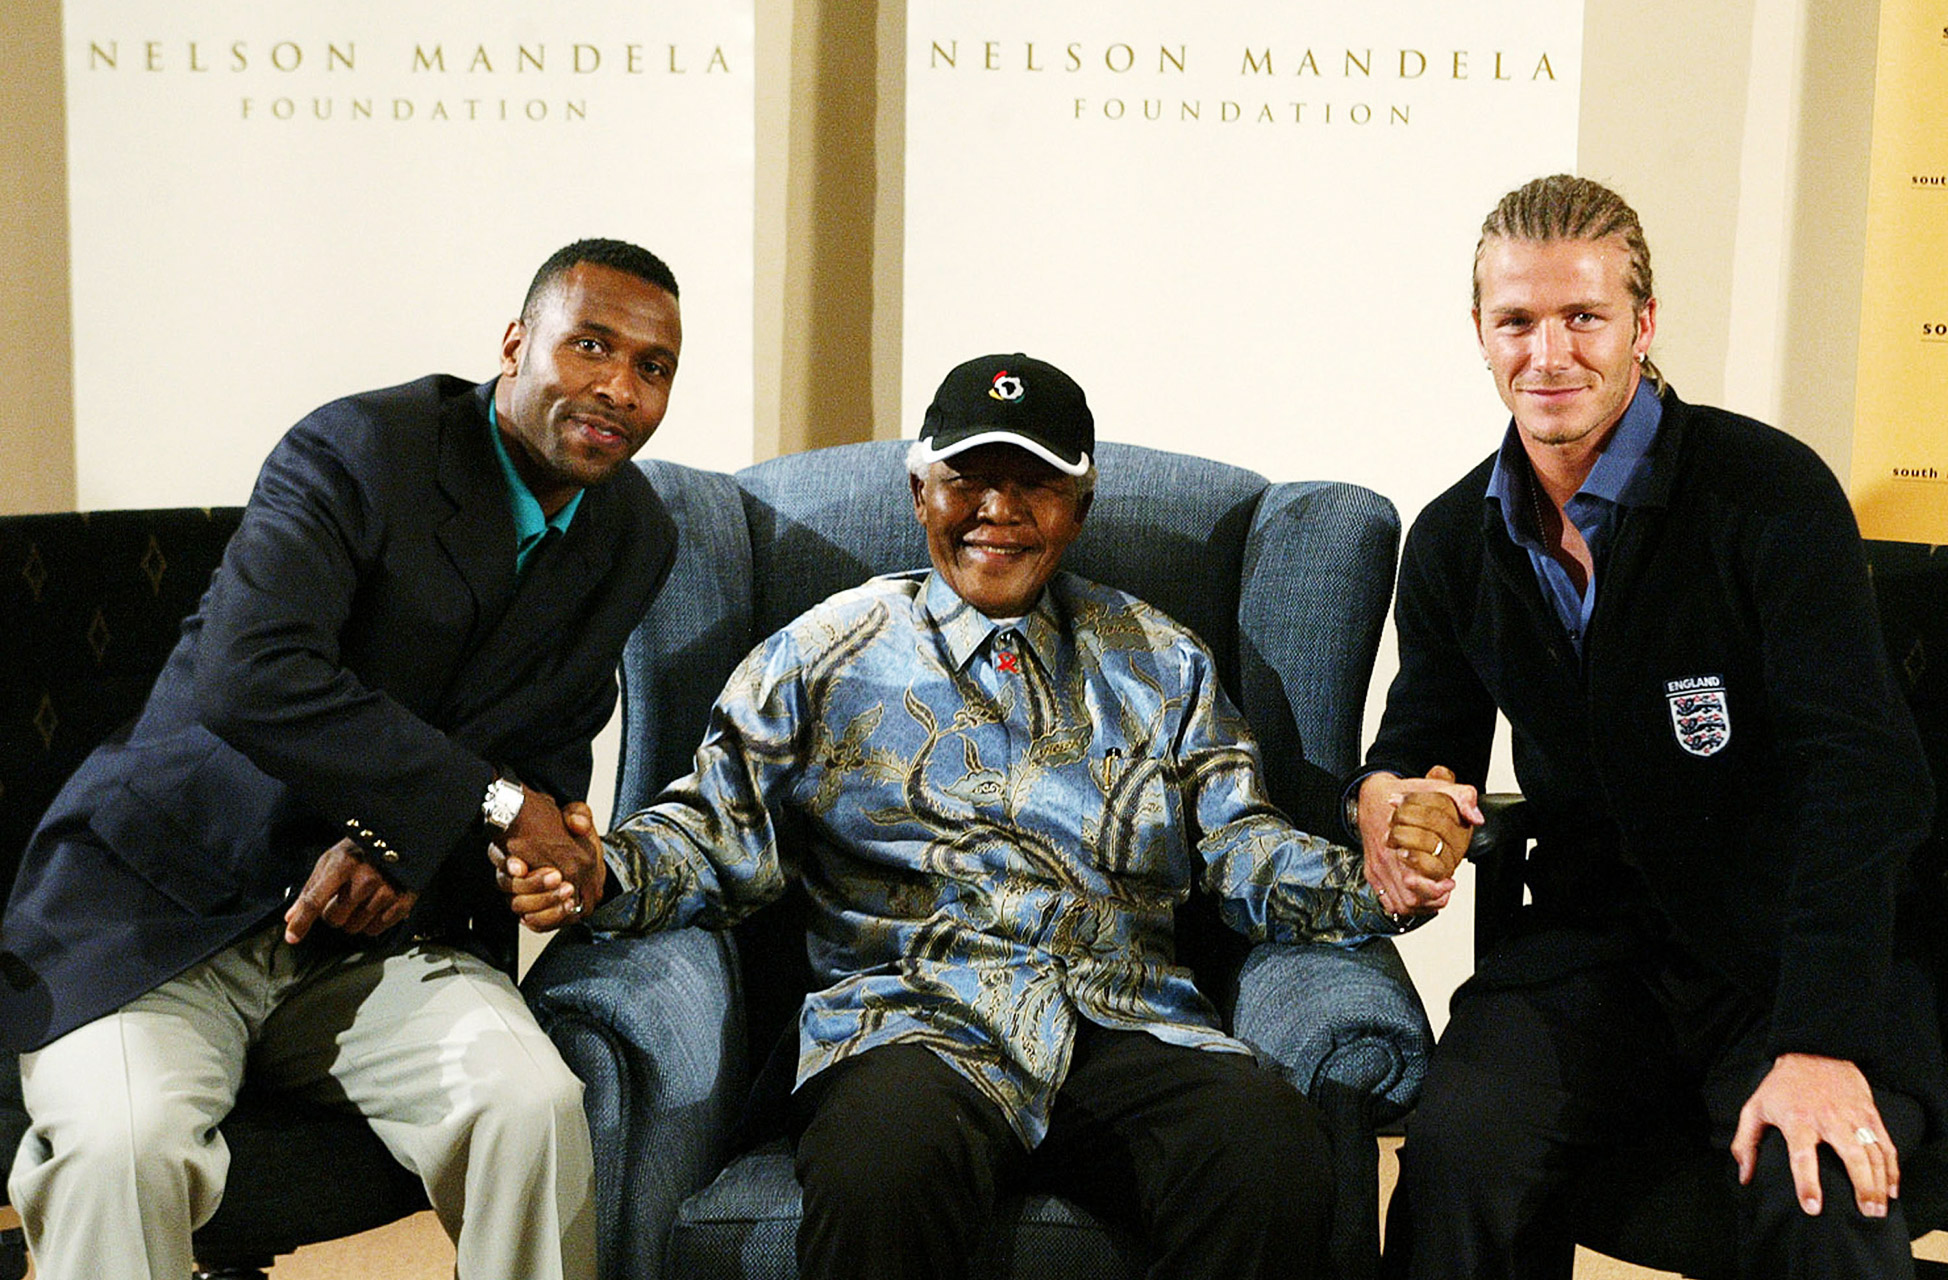 Lucas Radebe, Nelson Mandela and David Beckham